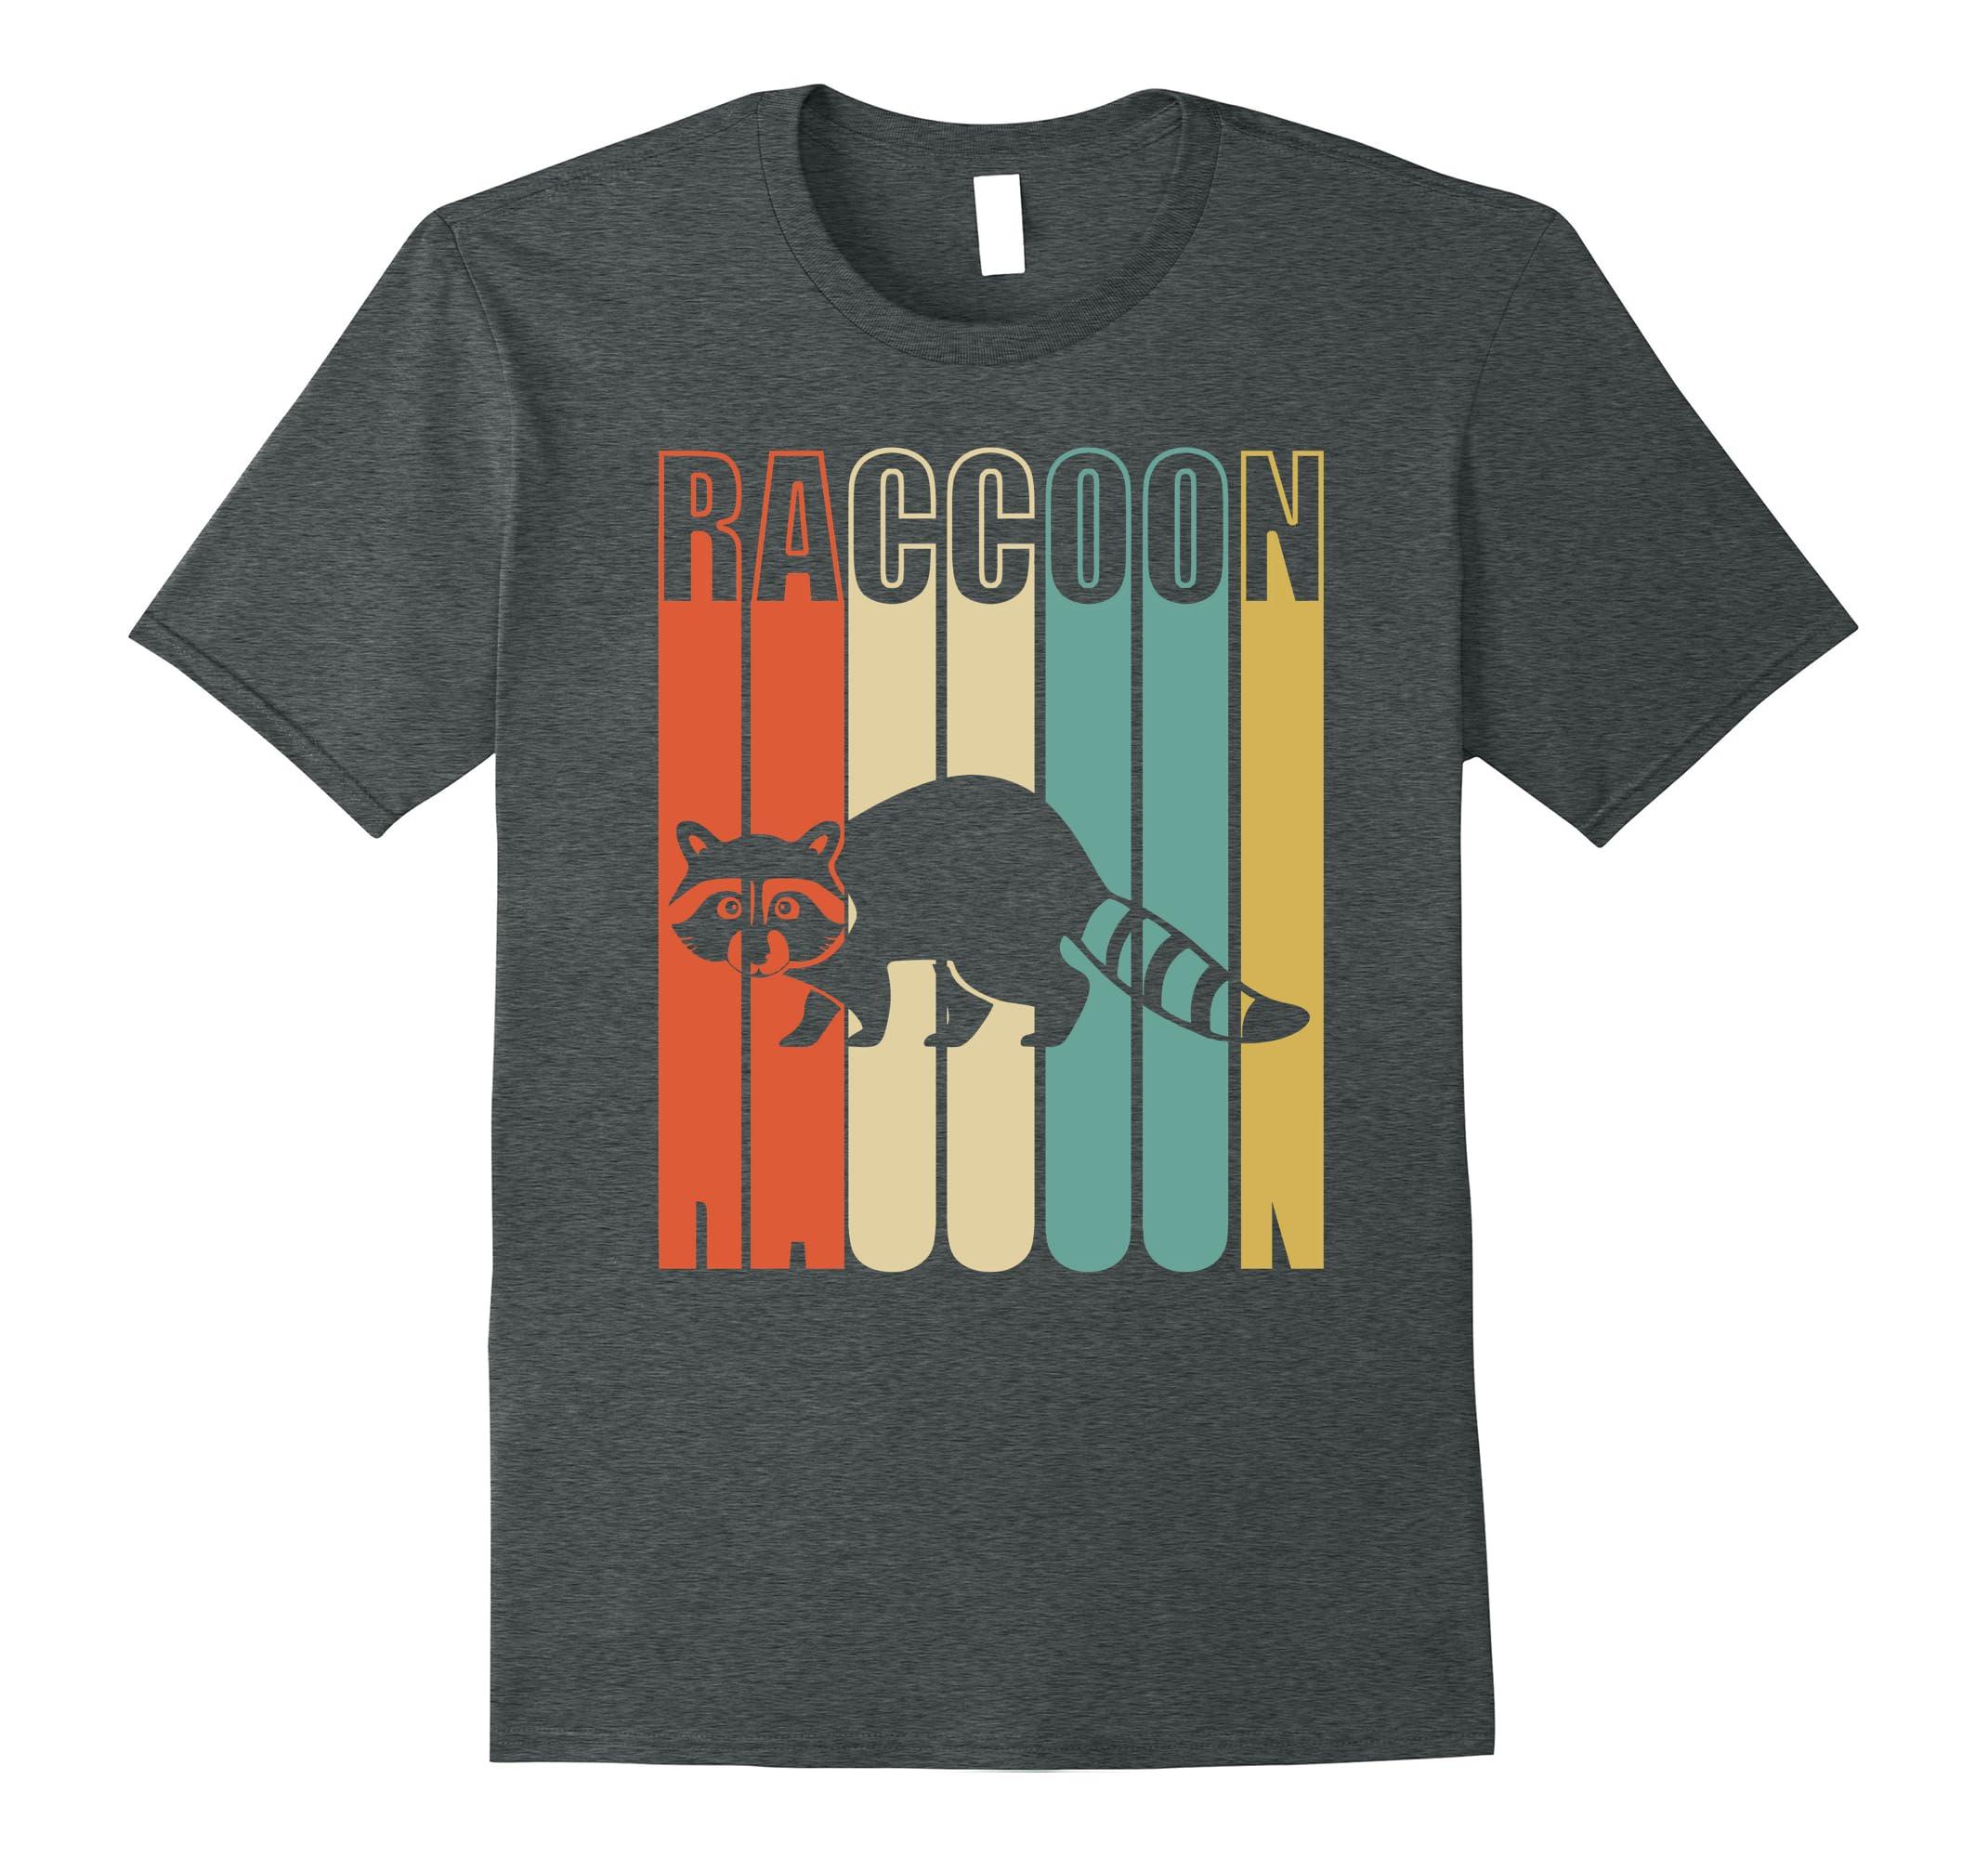 Raccoon Shirt Funny Vintage Silhouette-Tovacu